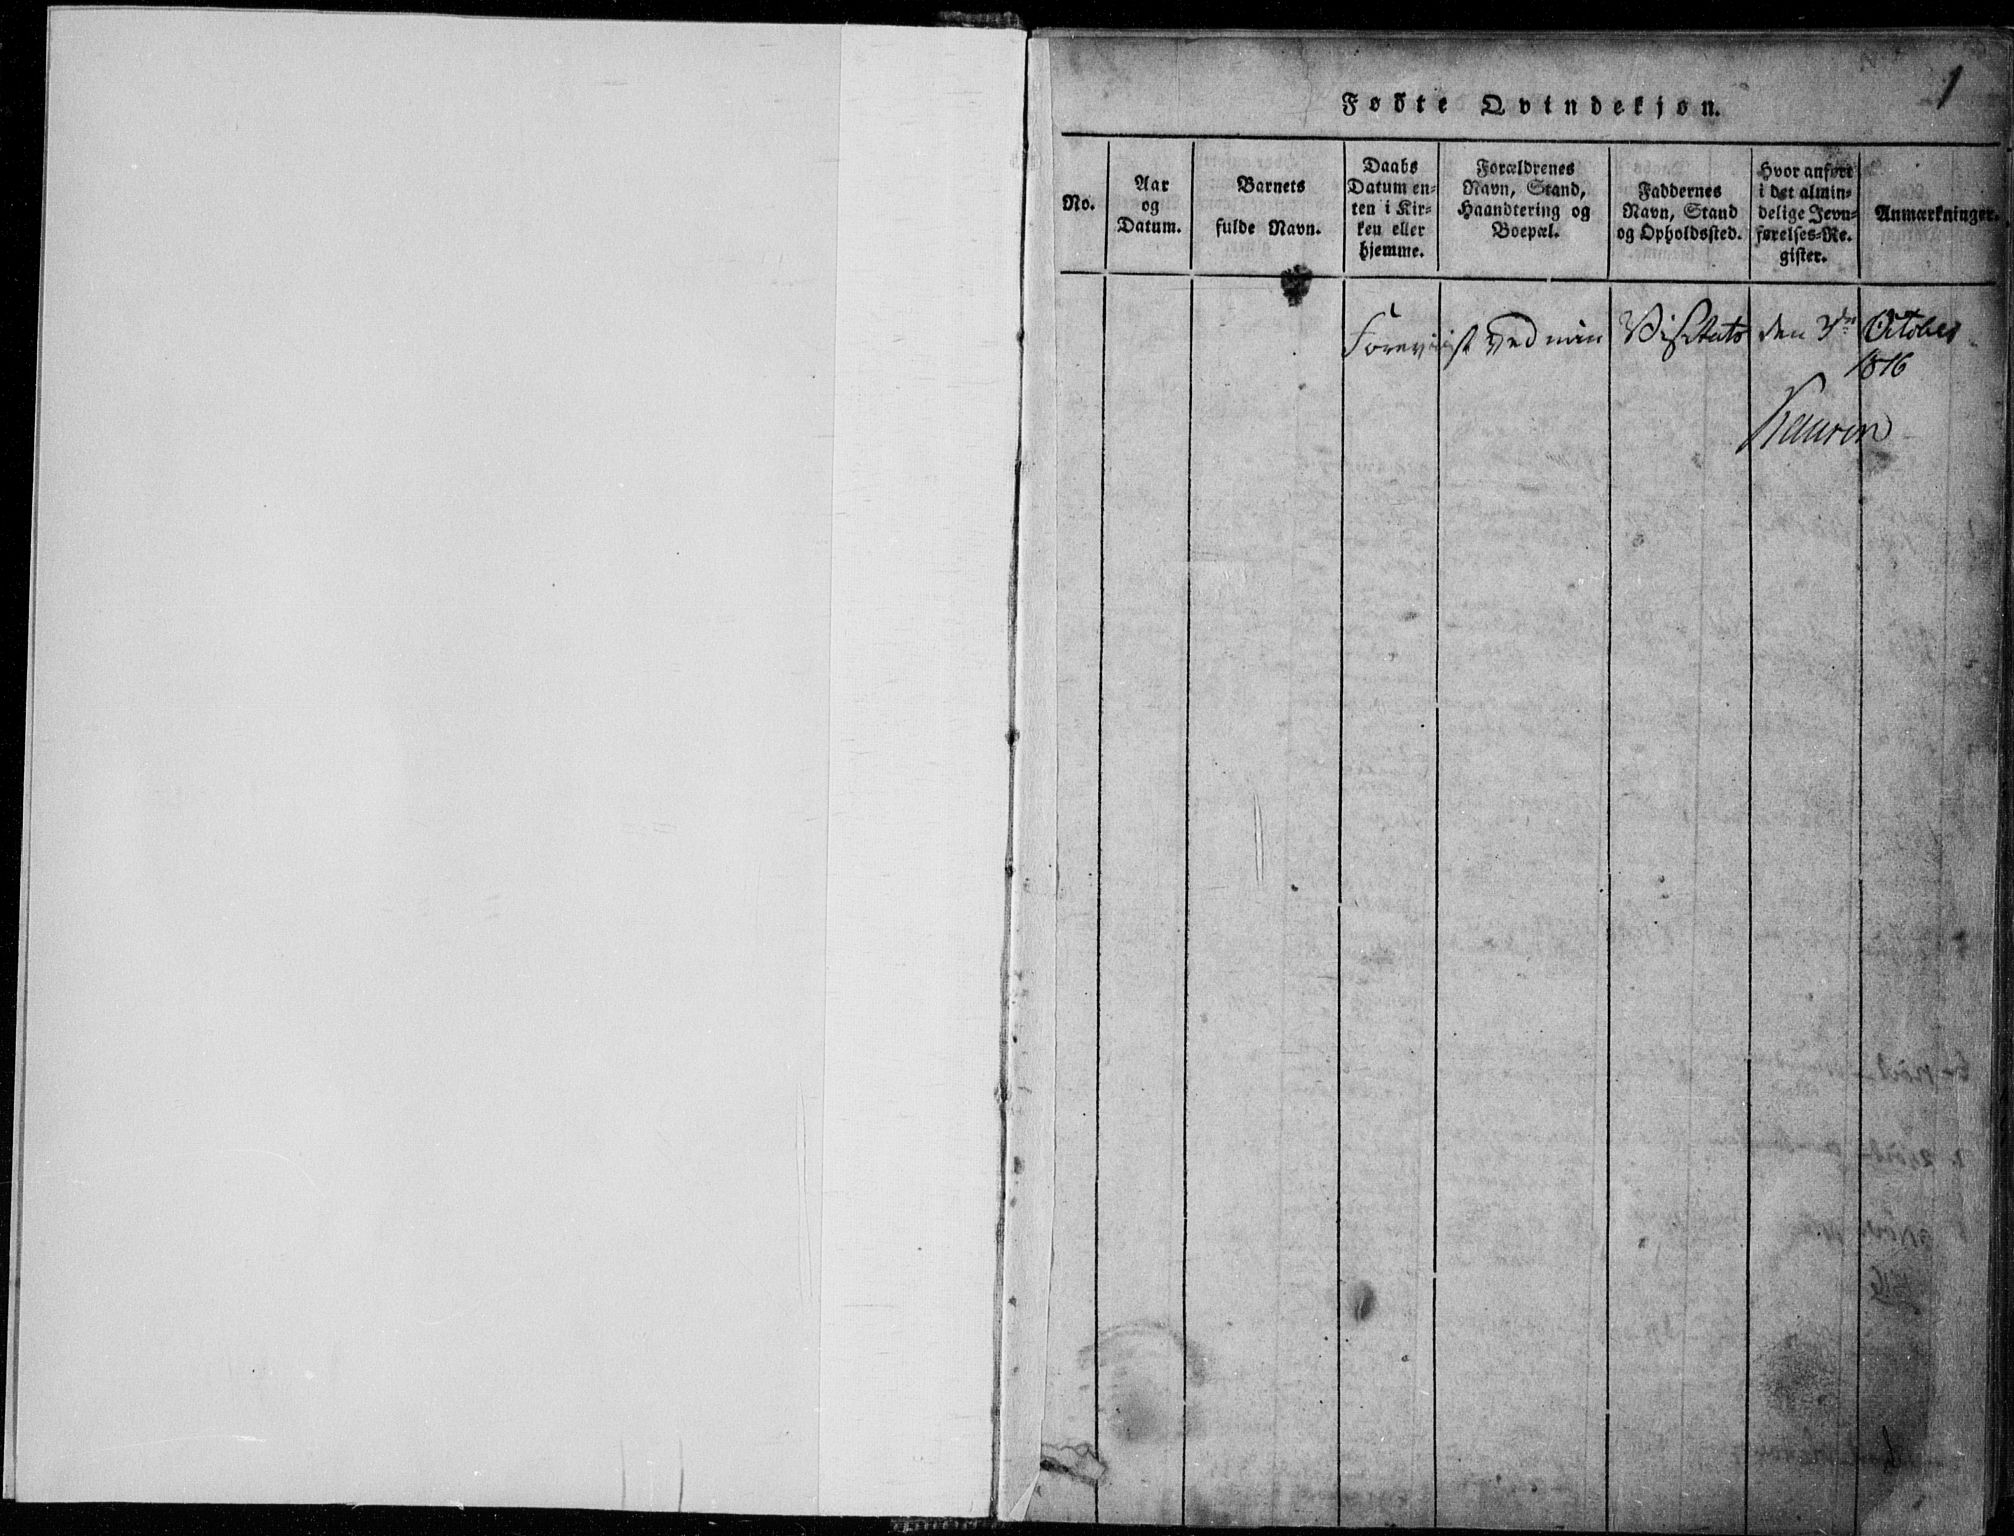 SAKO, Rauland kirkebøker, F/Fa/L0001: Ministerialbok nr. 1, 1814-1859, s. 1